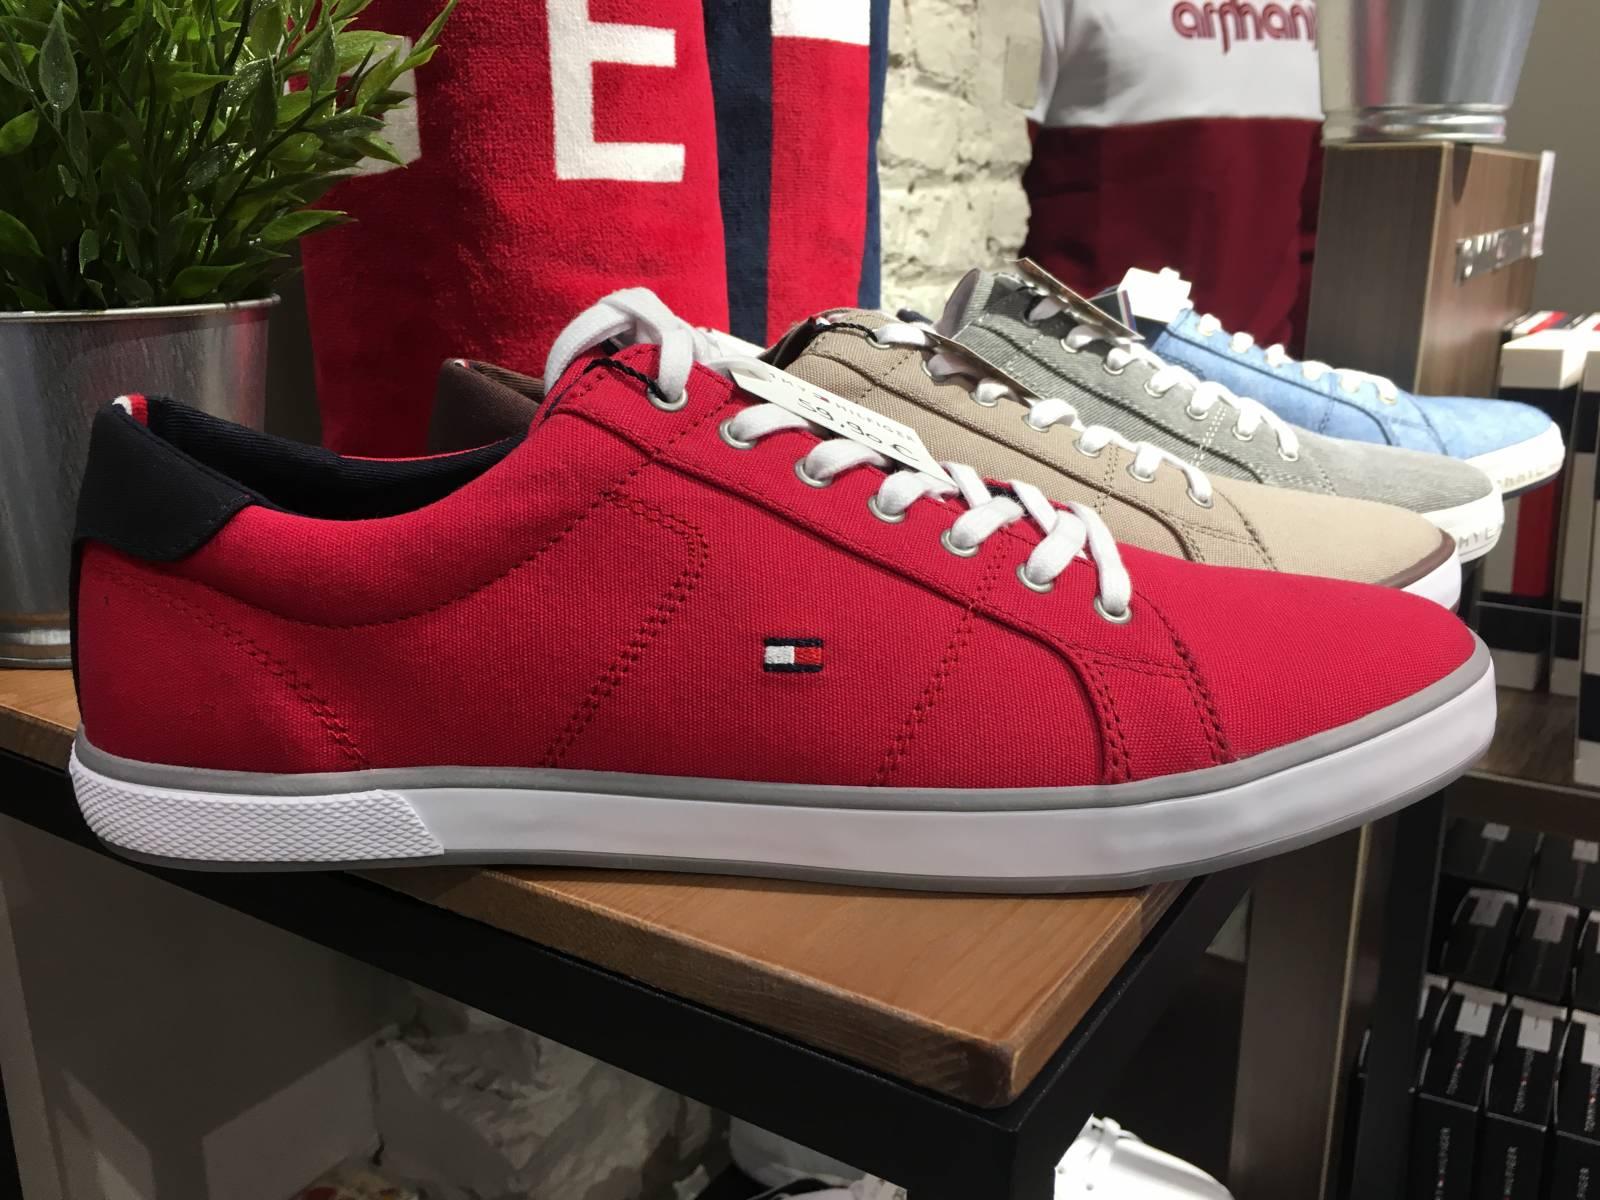 chaussures hommes et femme dieppe sneakers et chaussures habill es urban chic boutique. Black Bedroom Furniture Sets. Home Design Ideas